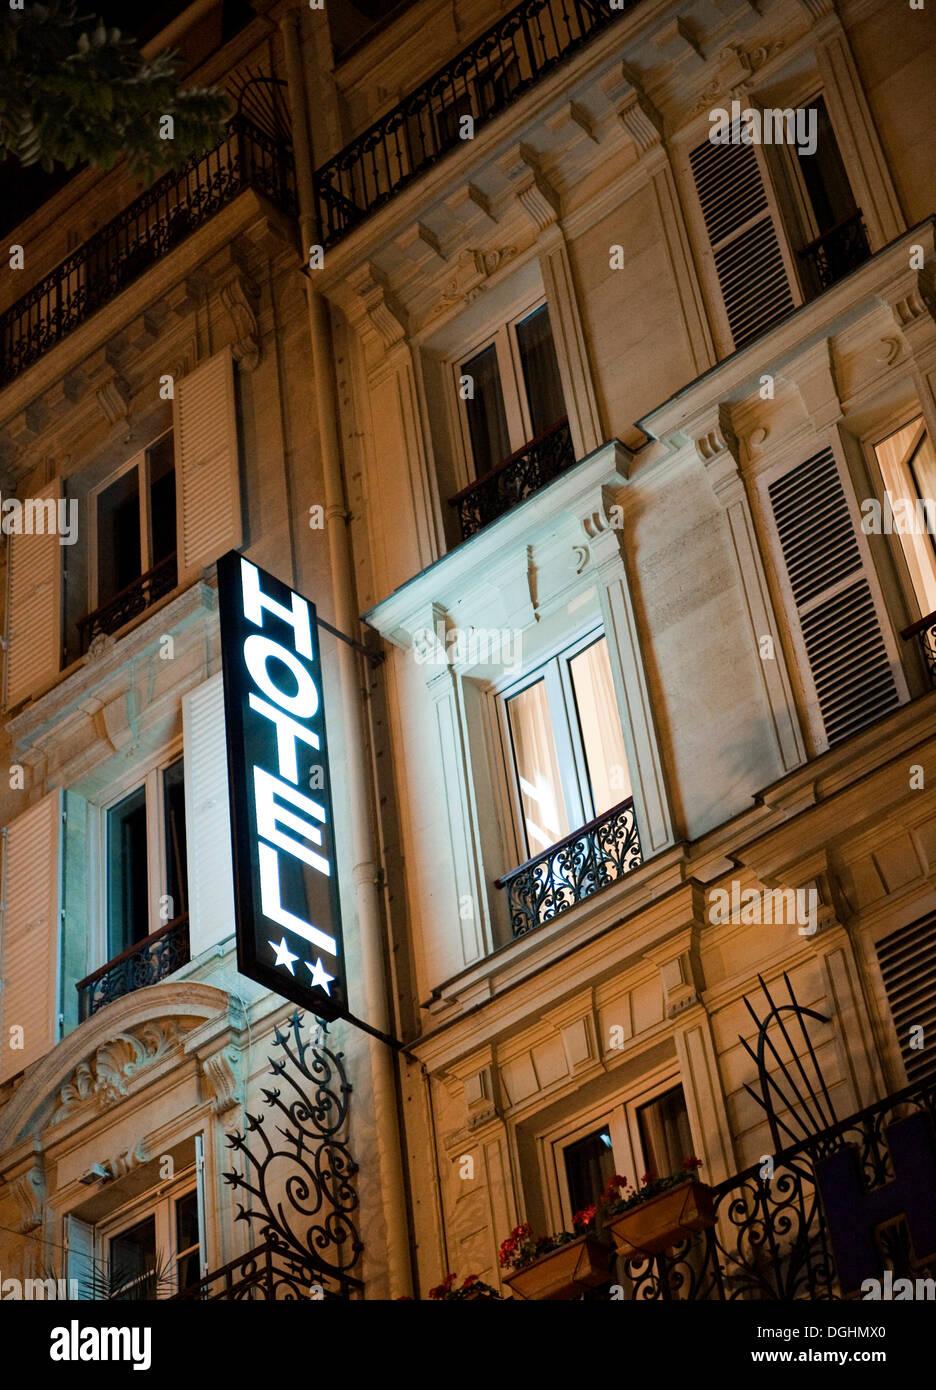 Hotel sign on Bouldevard Saint Marcel, Quartier Latin, Paris, Ile de France region, France, Europe - Stock Image